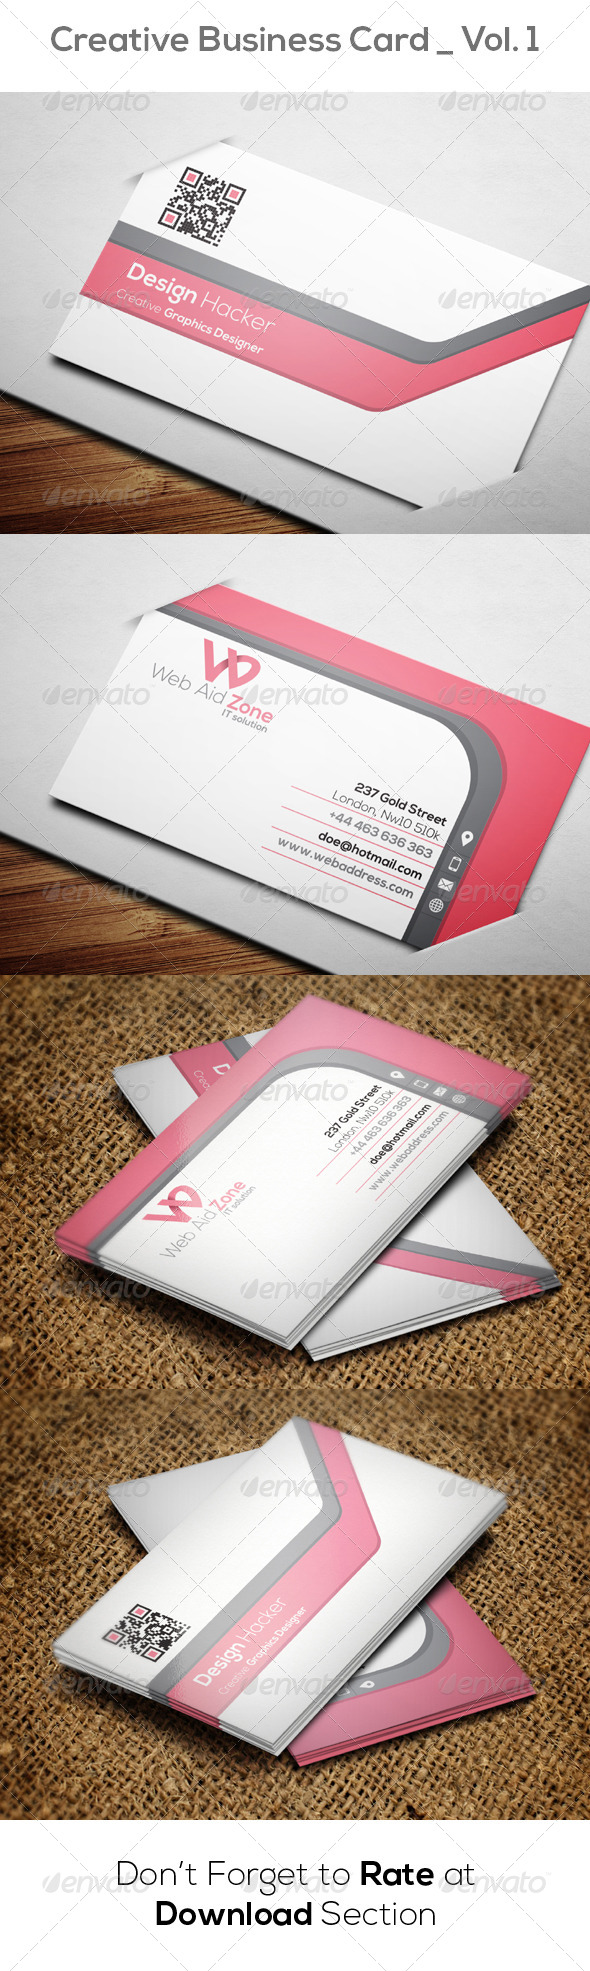 GraphicRiver Creative Business Card Vol 1 8576453